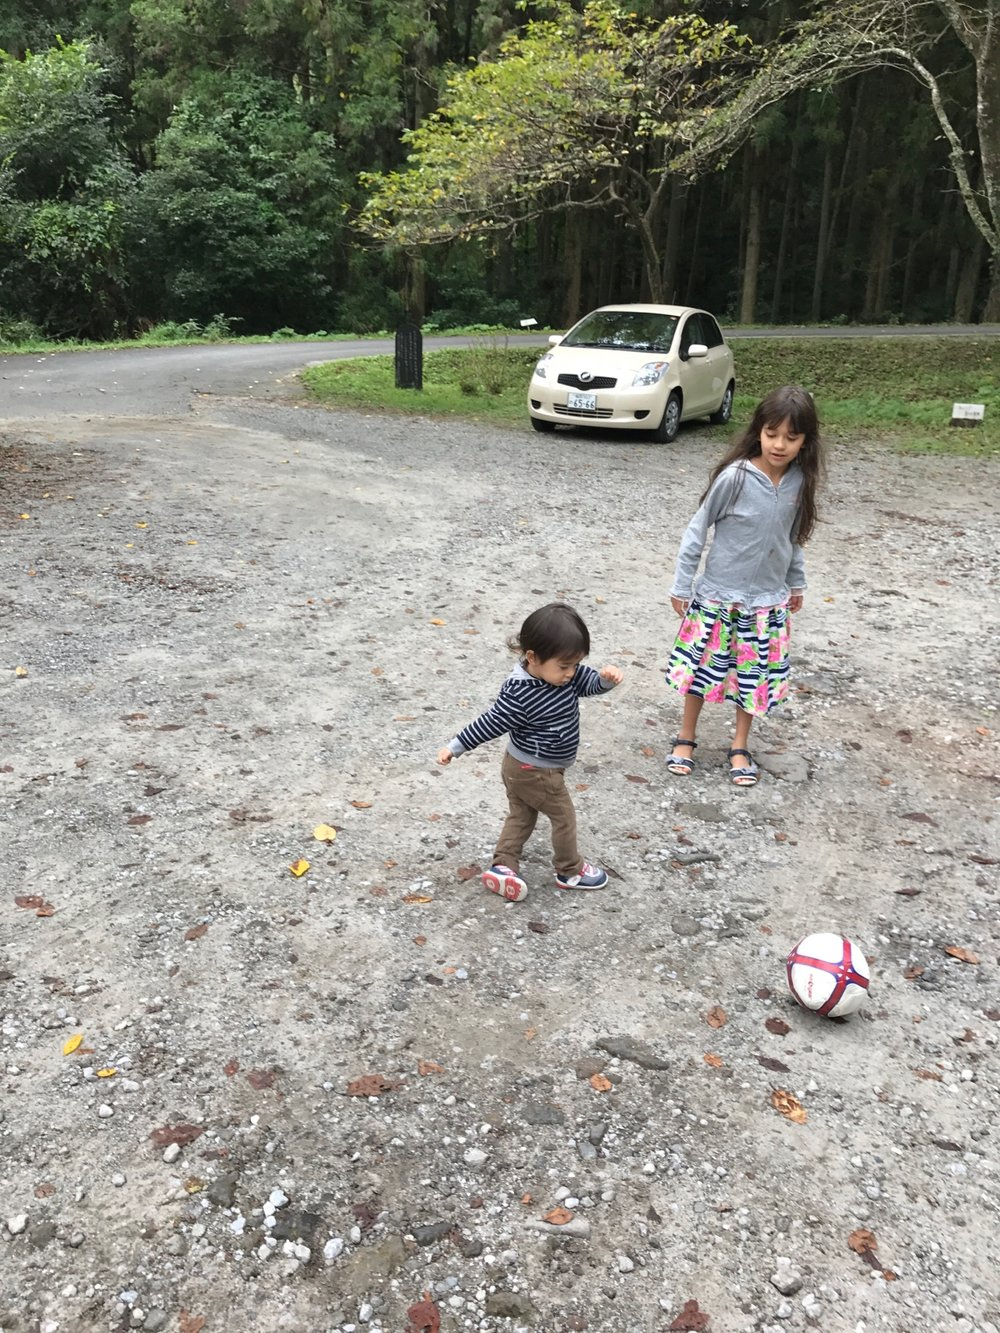 Alexander playing football